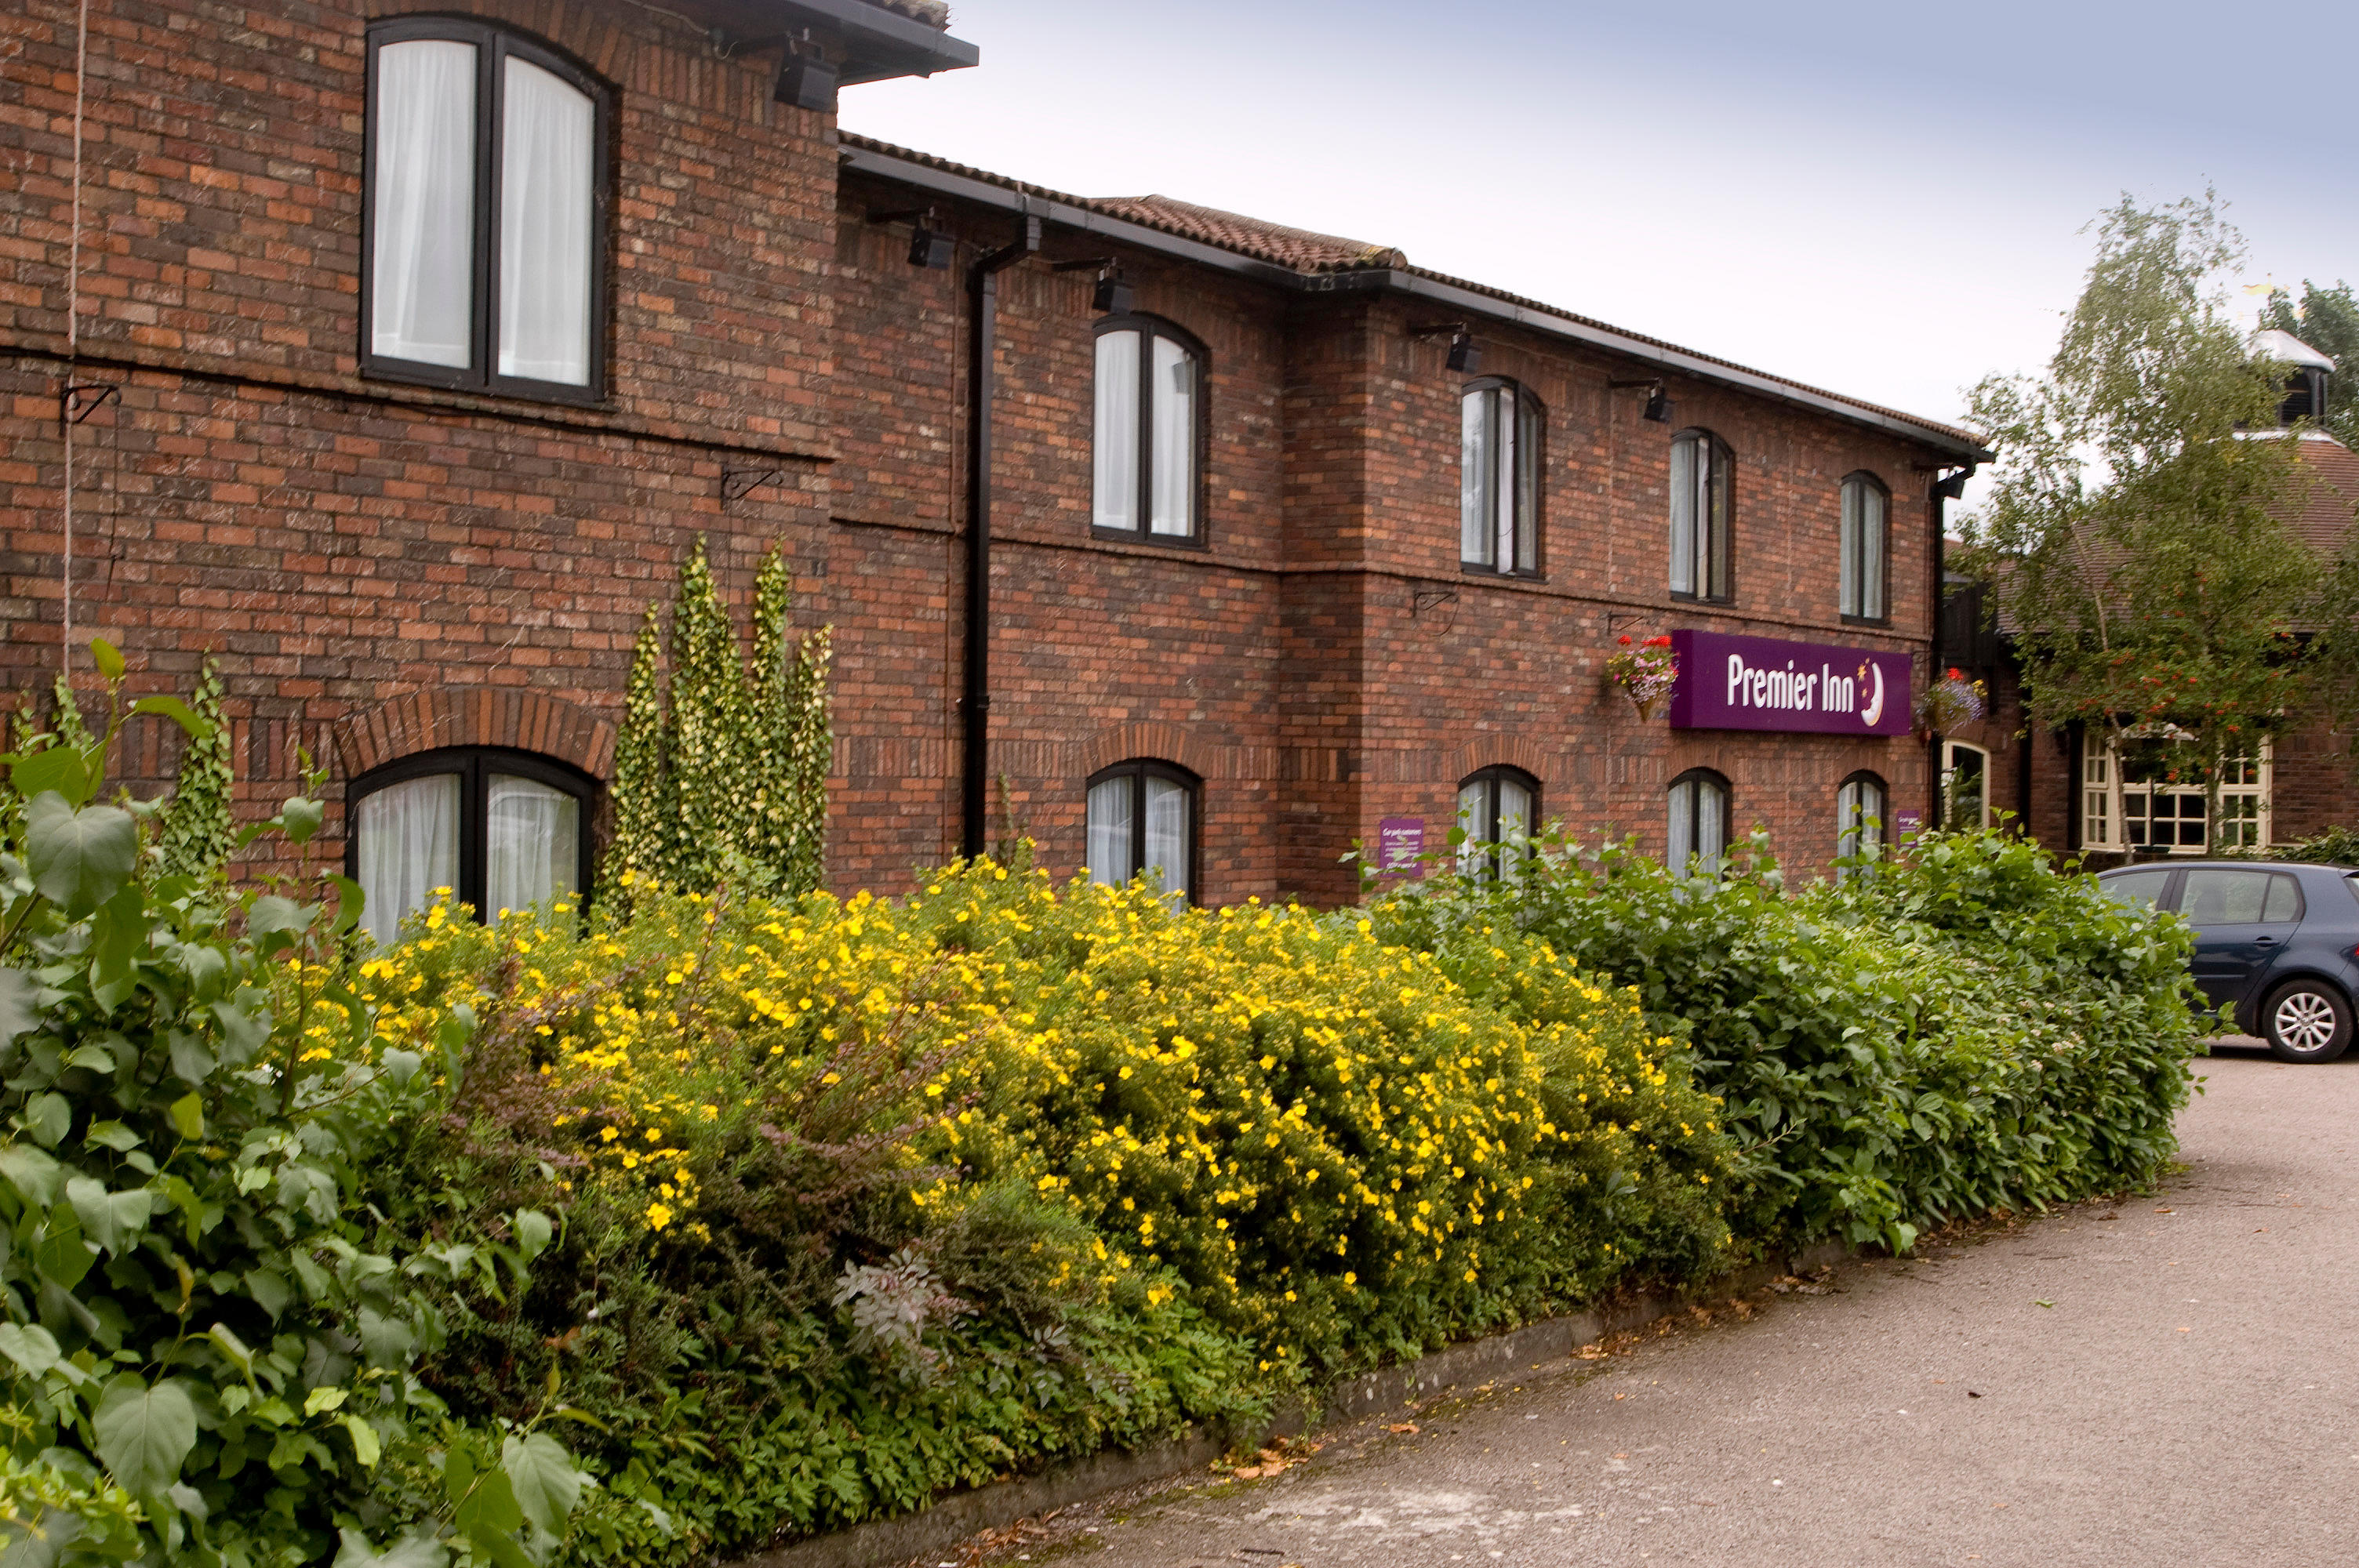 Premier Inn Carlisle Central North hotel